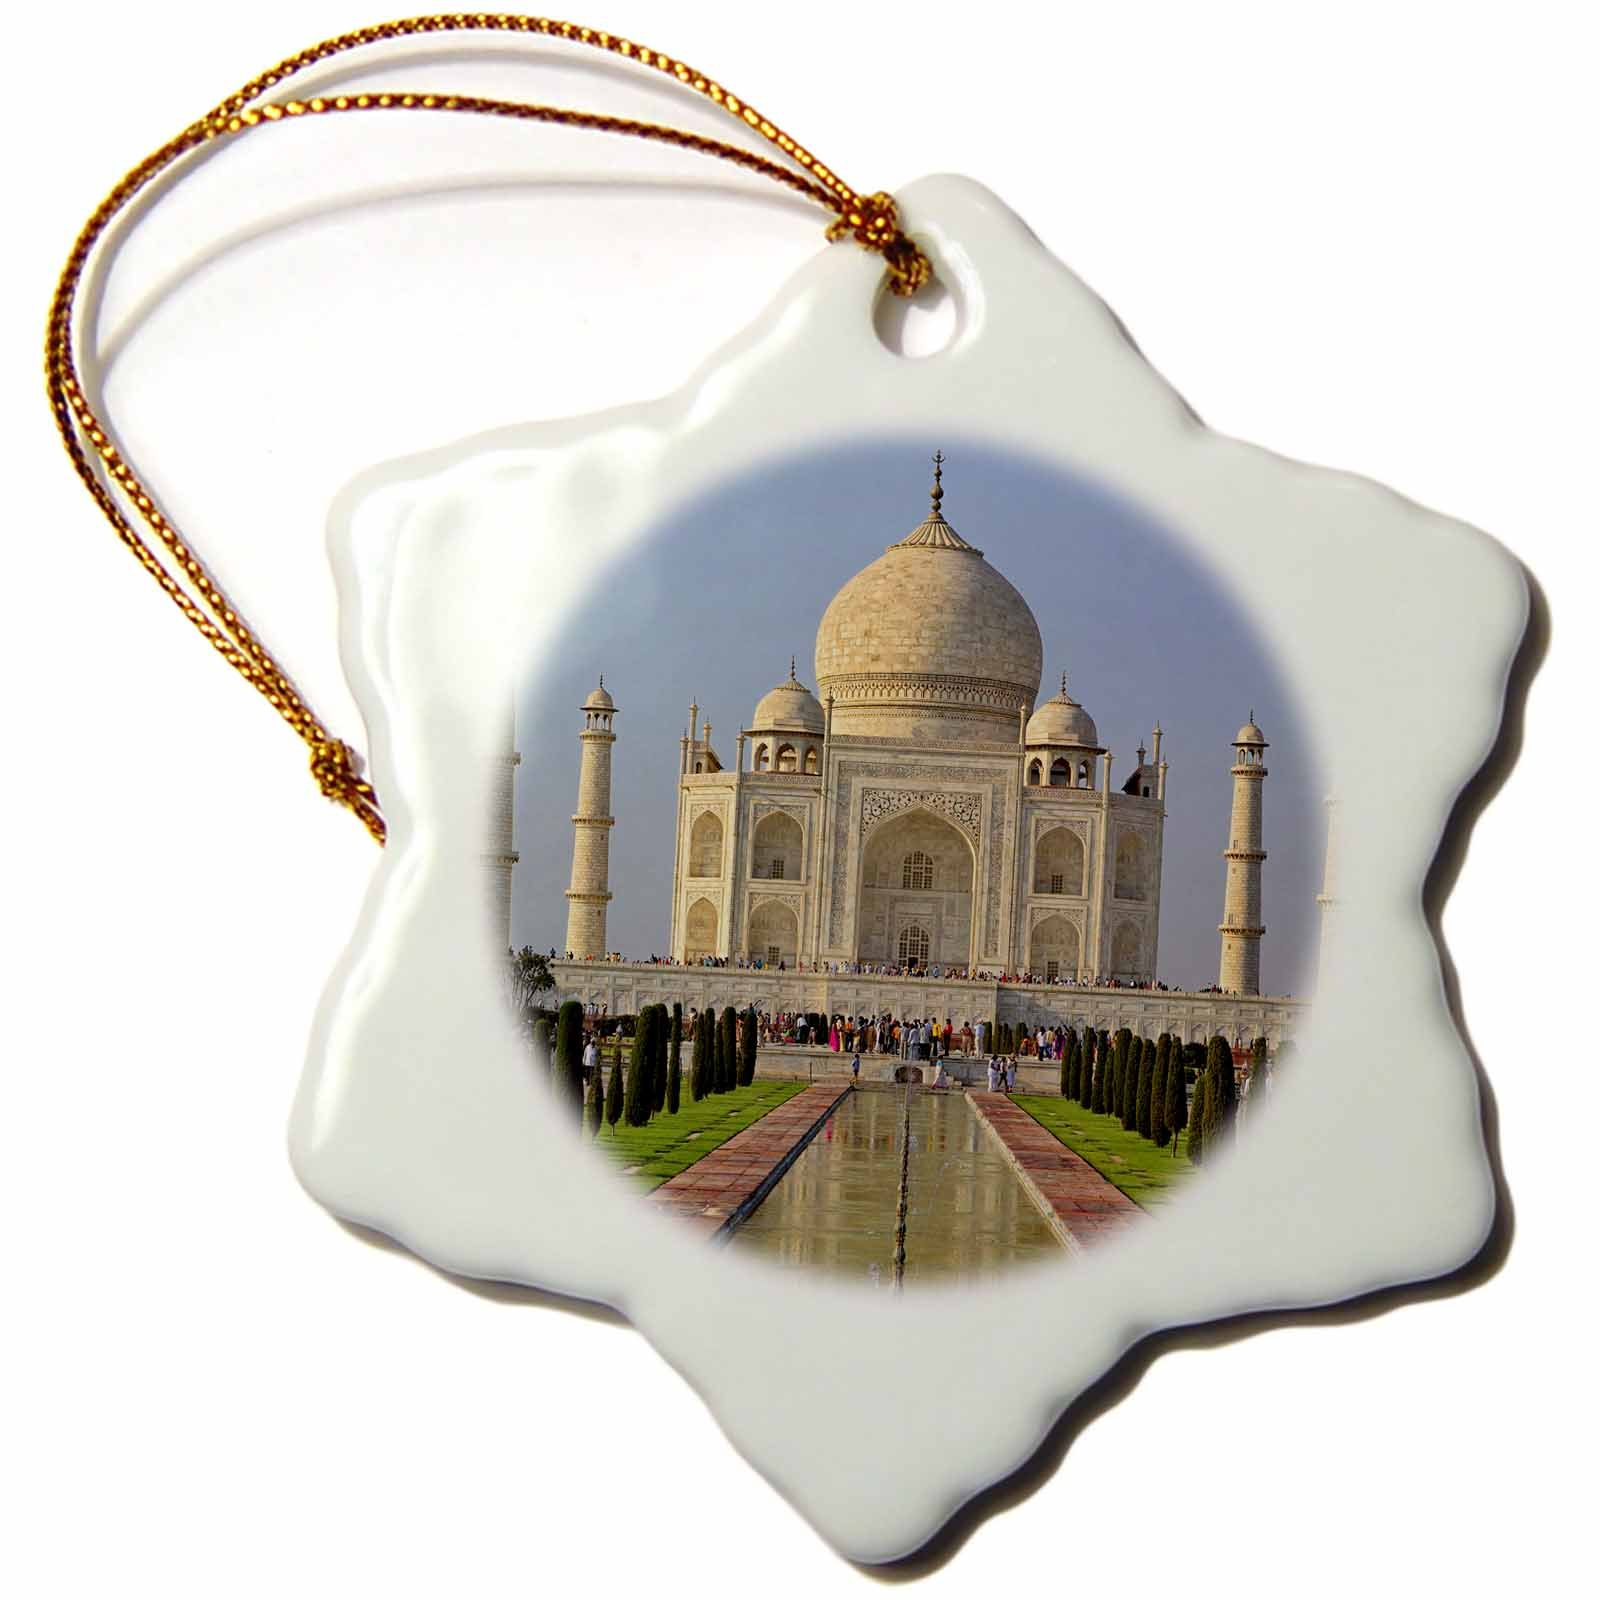 3dRose orn_75425_1 Taj Mahal, Agra, India-As10 Aje0014-Adam Jones-Snowflake Ornament, 3-Inch, Porcelain by 3dRose (Image #1)